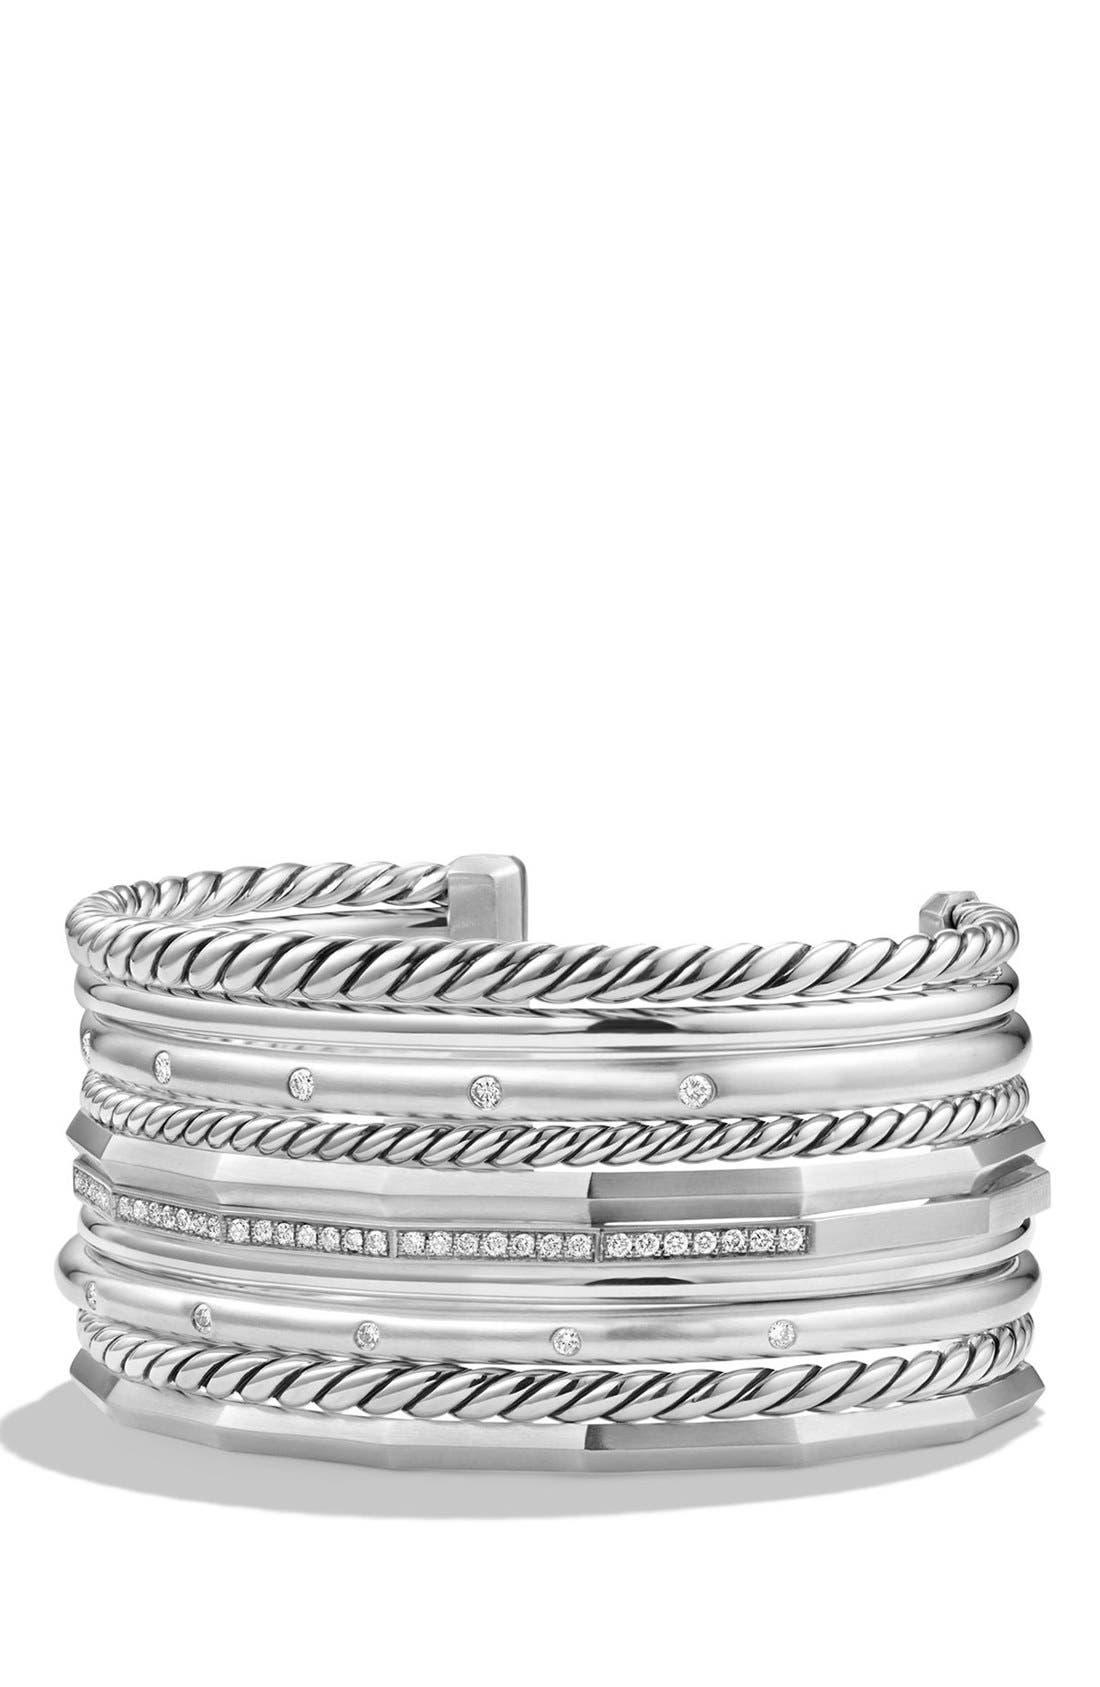 Alternate Image 1 Selected - David Yurman 'Stax' Wide Cuff Bracelet with Diamonds